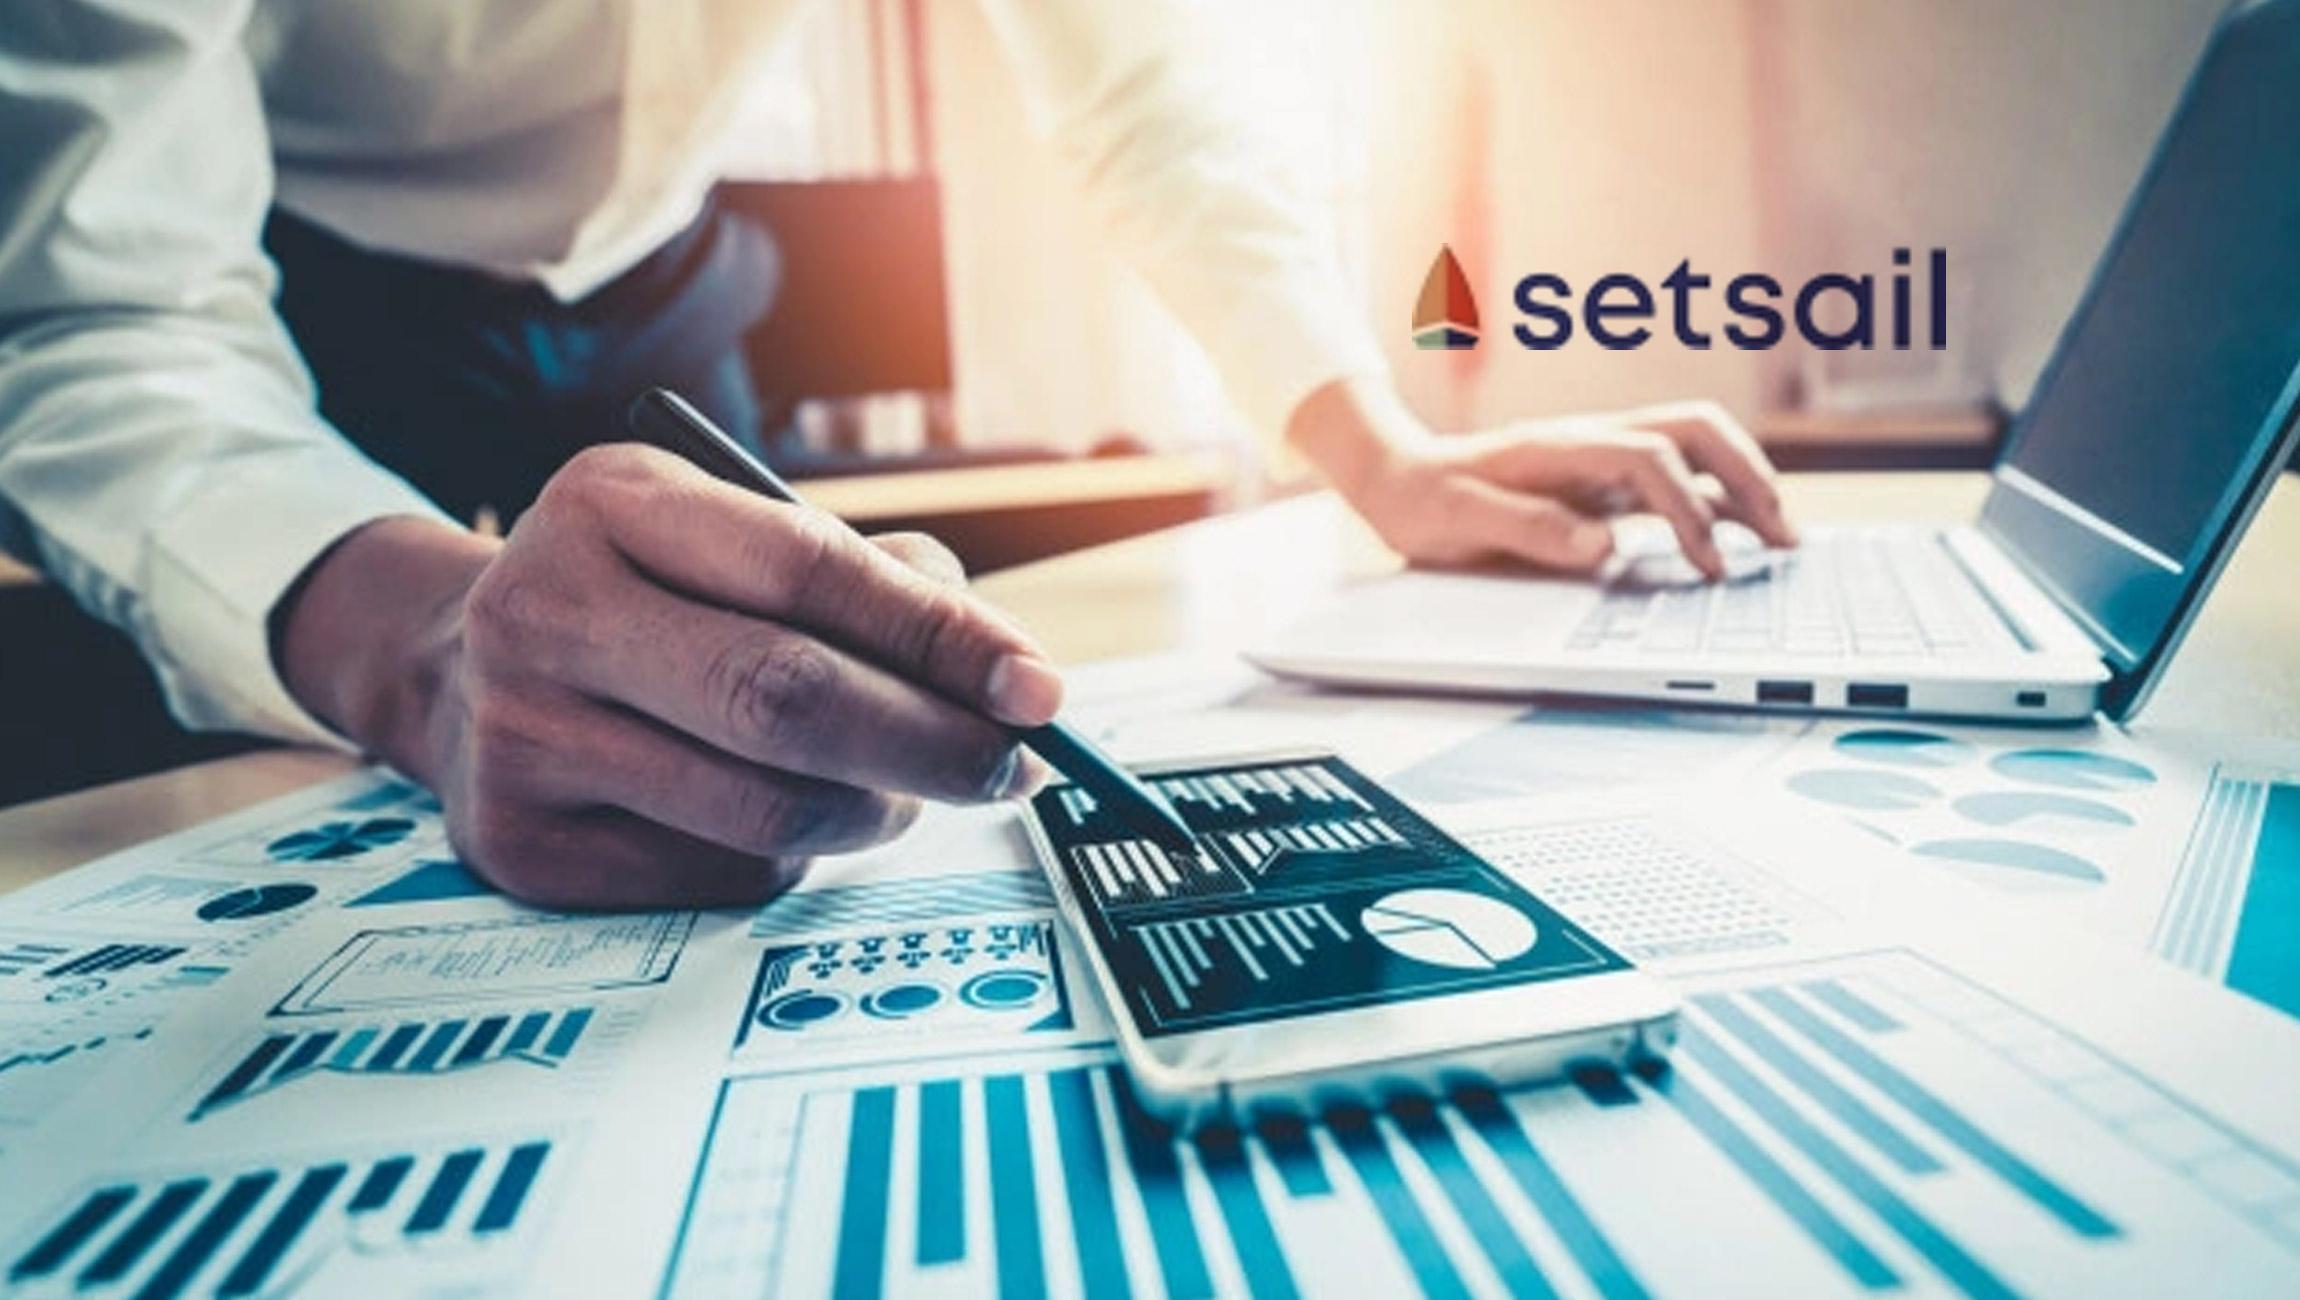 SetSail Debuts New AI-powered Solutions to Help Sales Teams Unlock More Revenue, Hosts First SetSail Voyage Sales Keynote